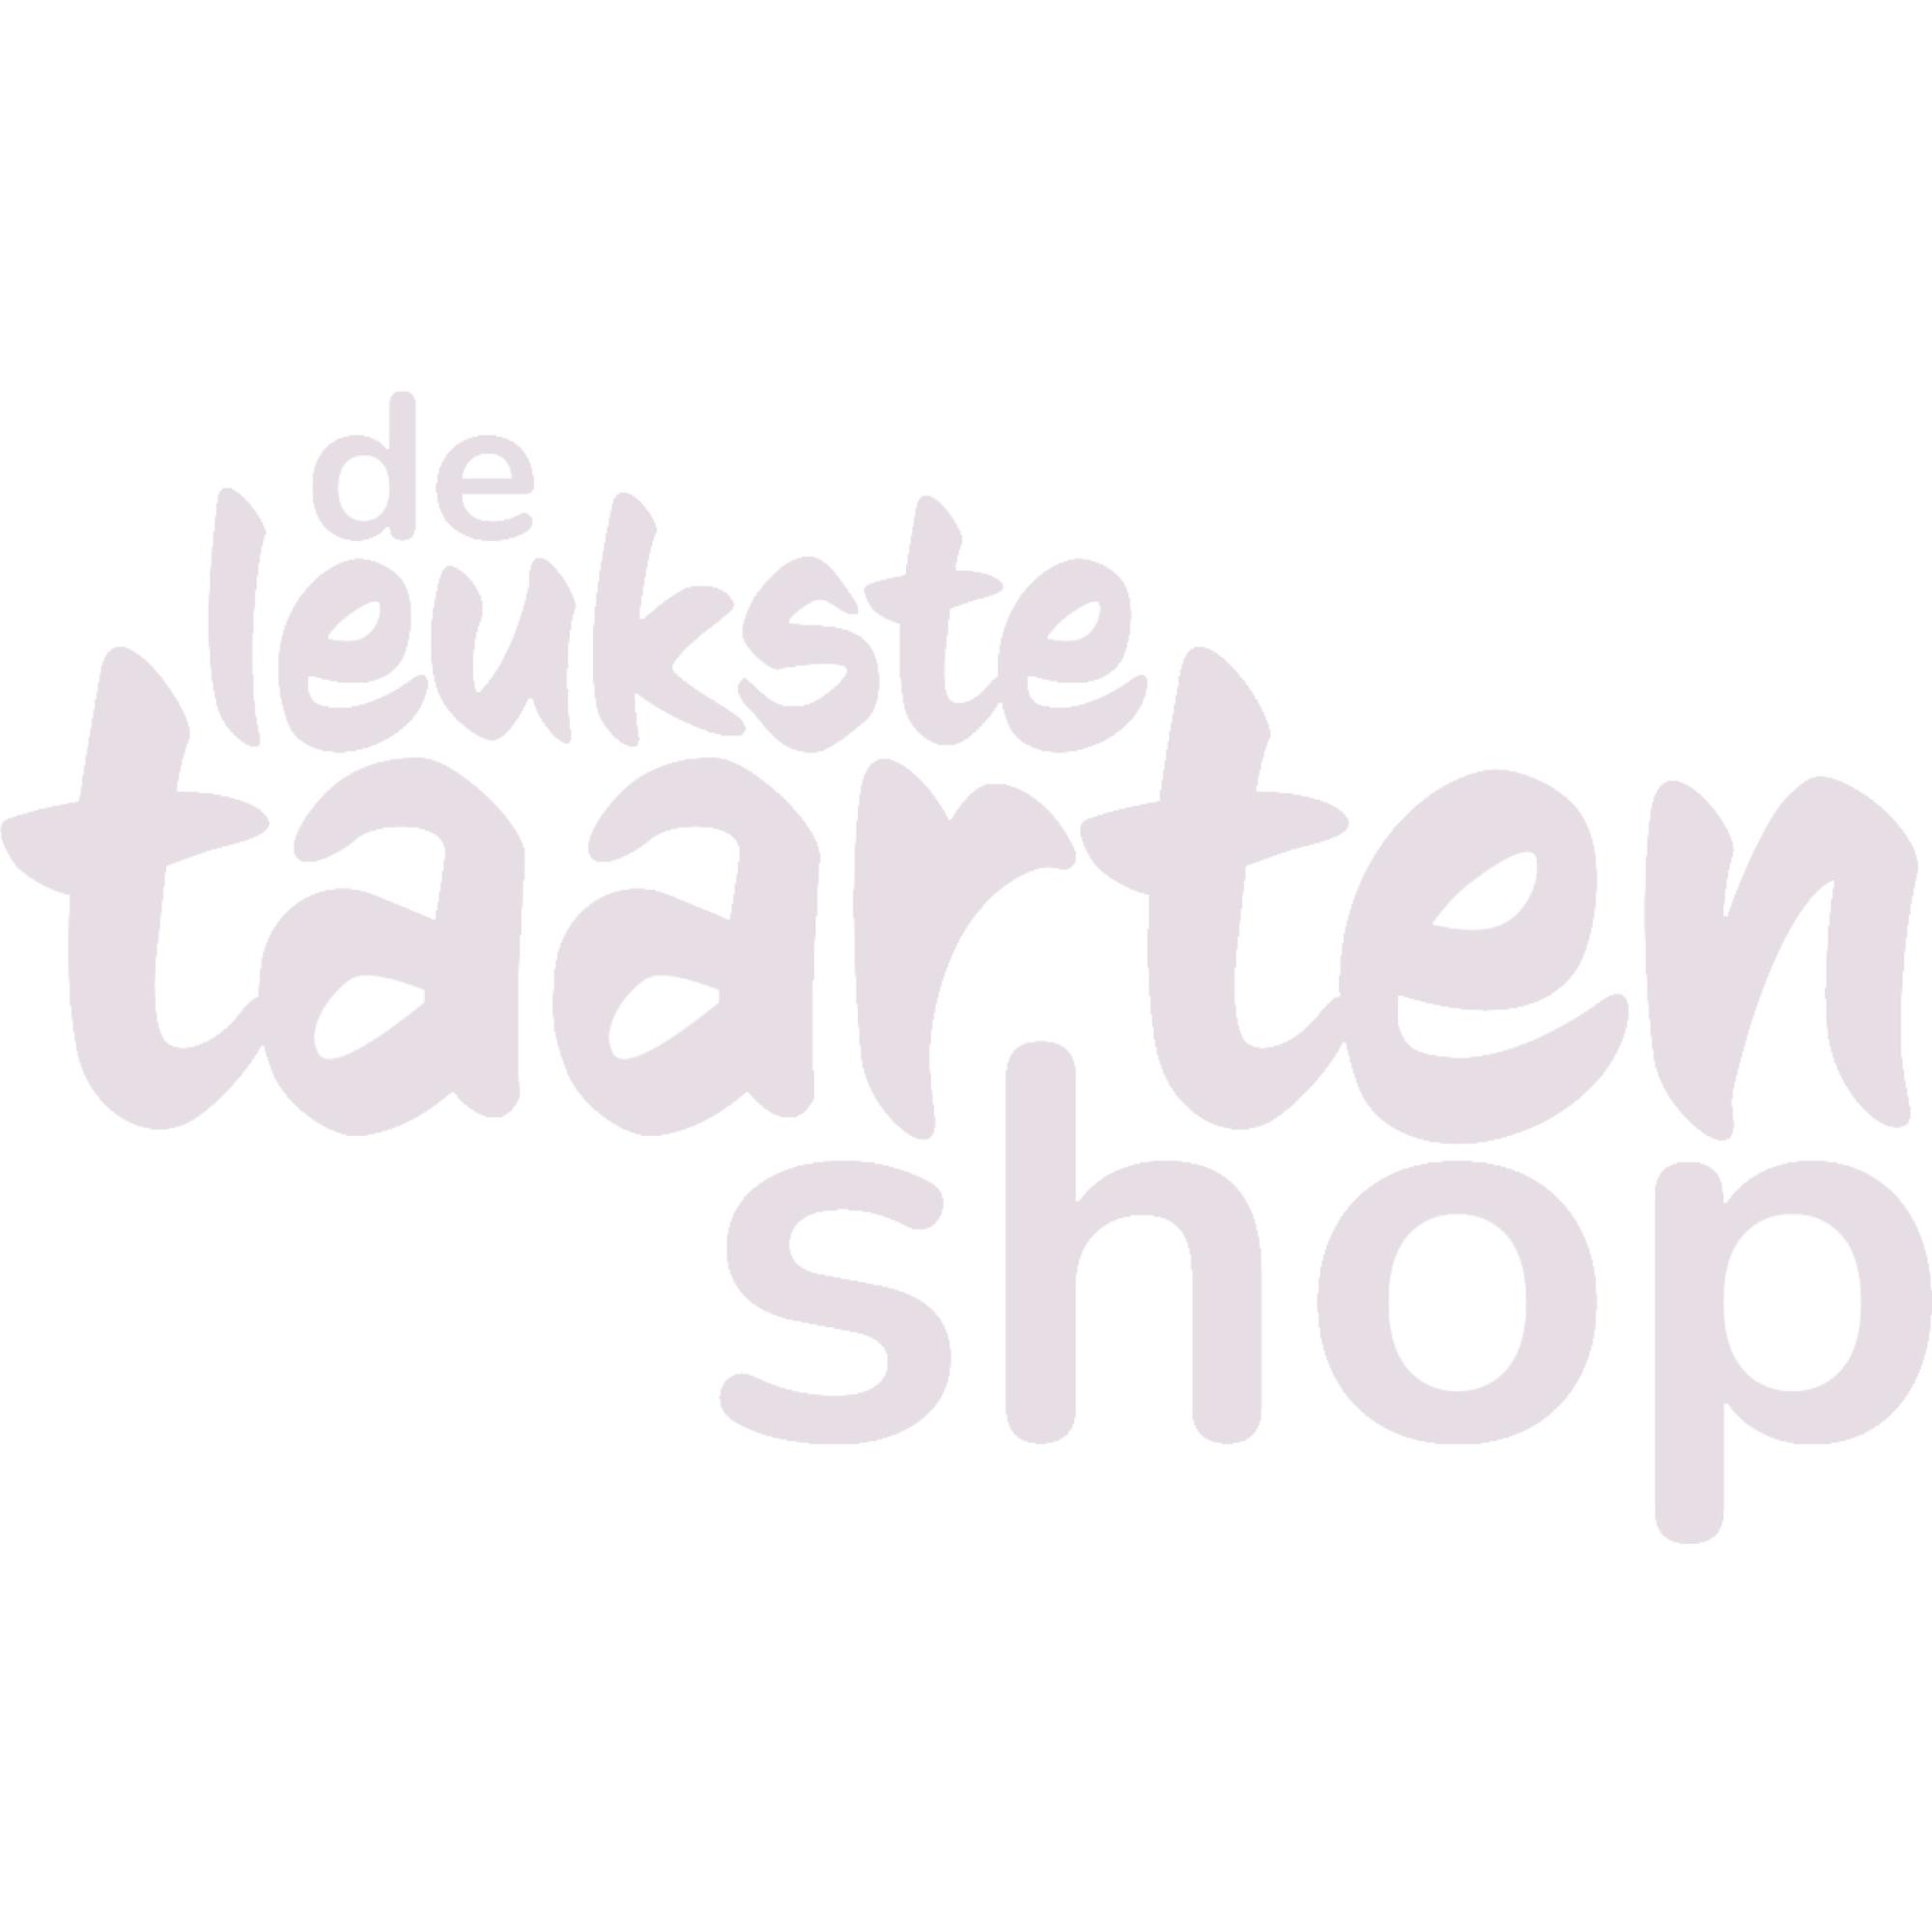 FunCakes Marsepein Voetbalschoen Wit en Oranje 12st.